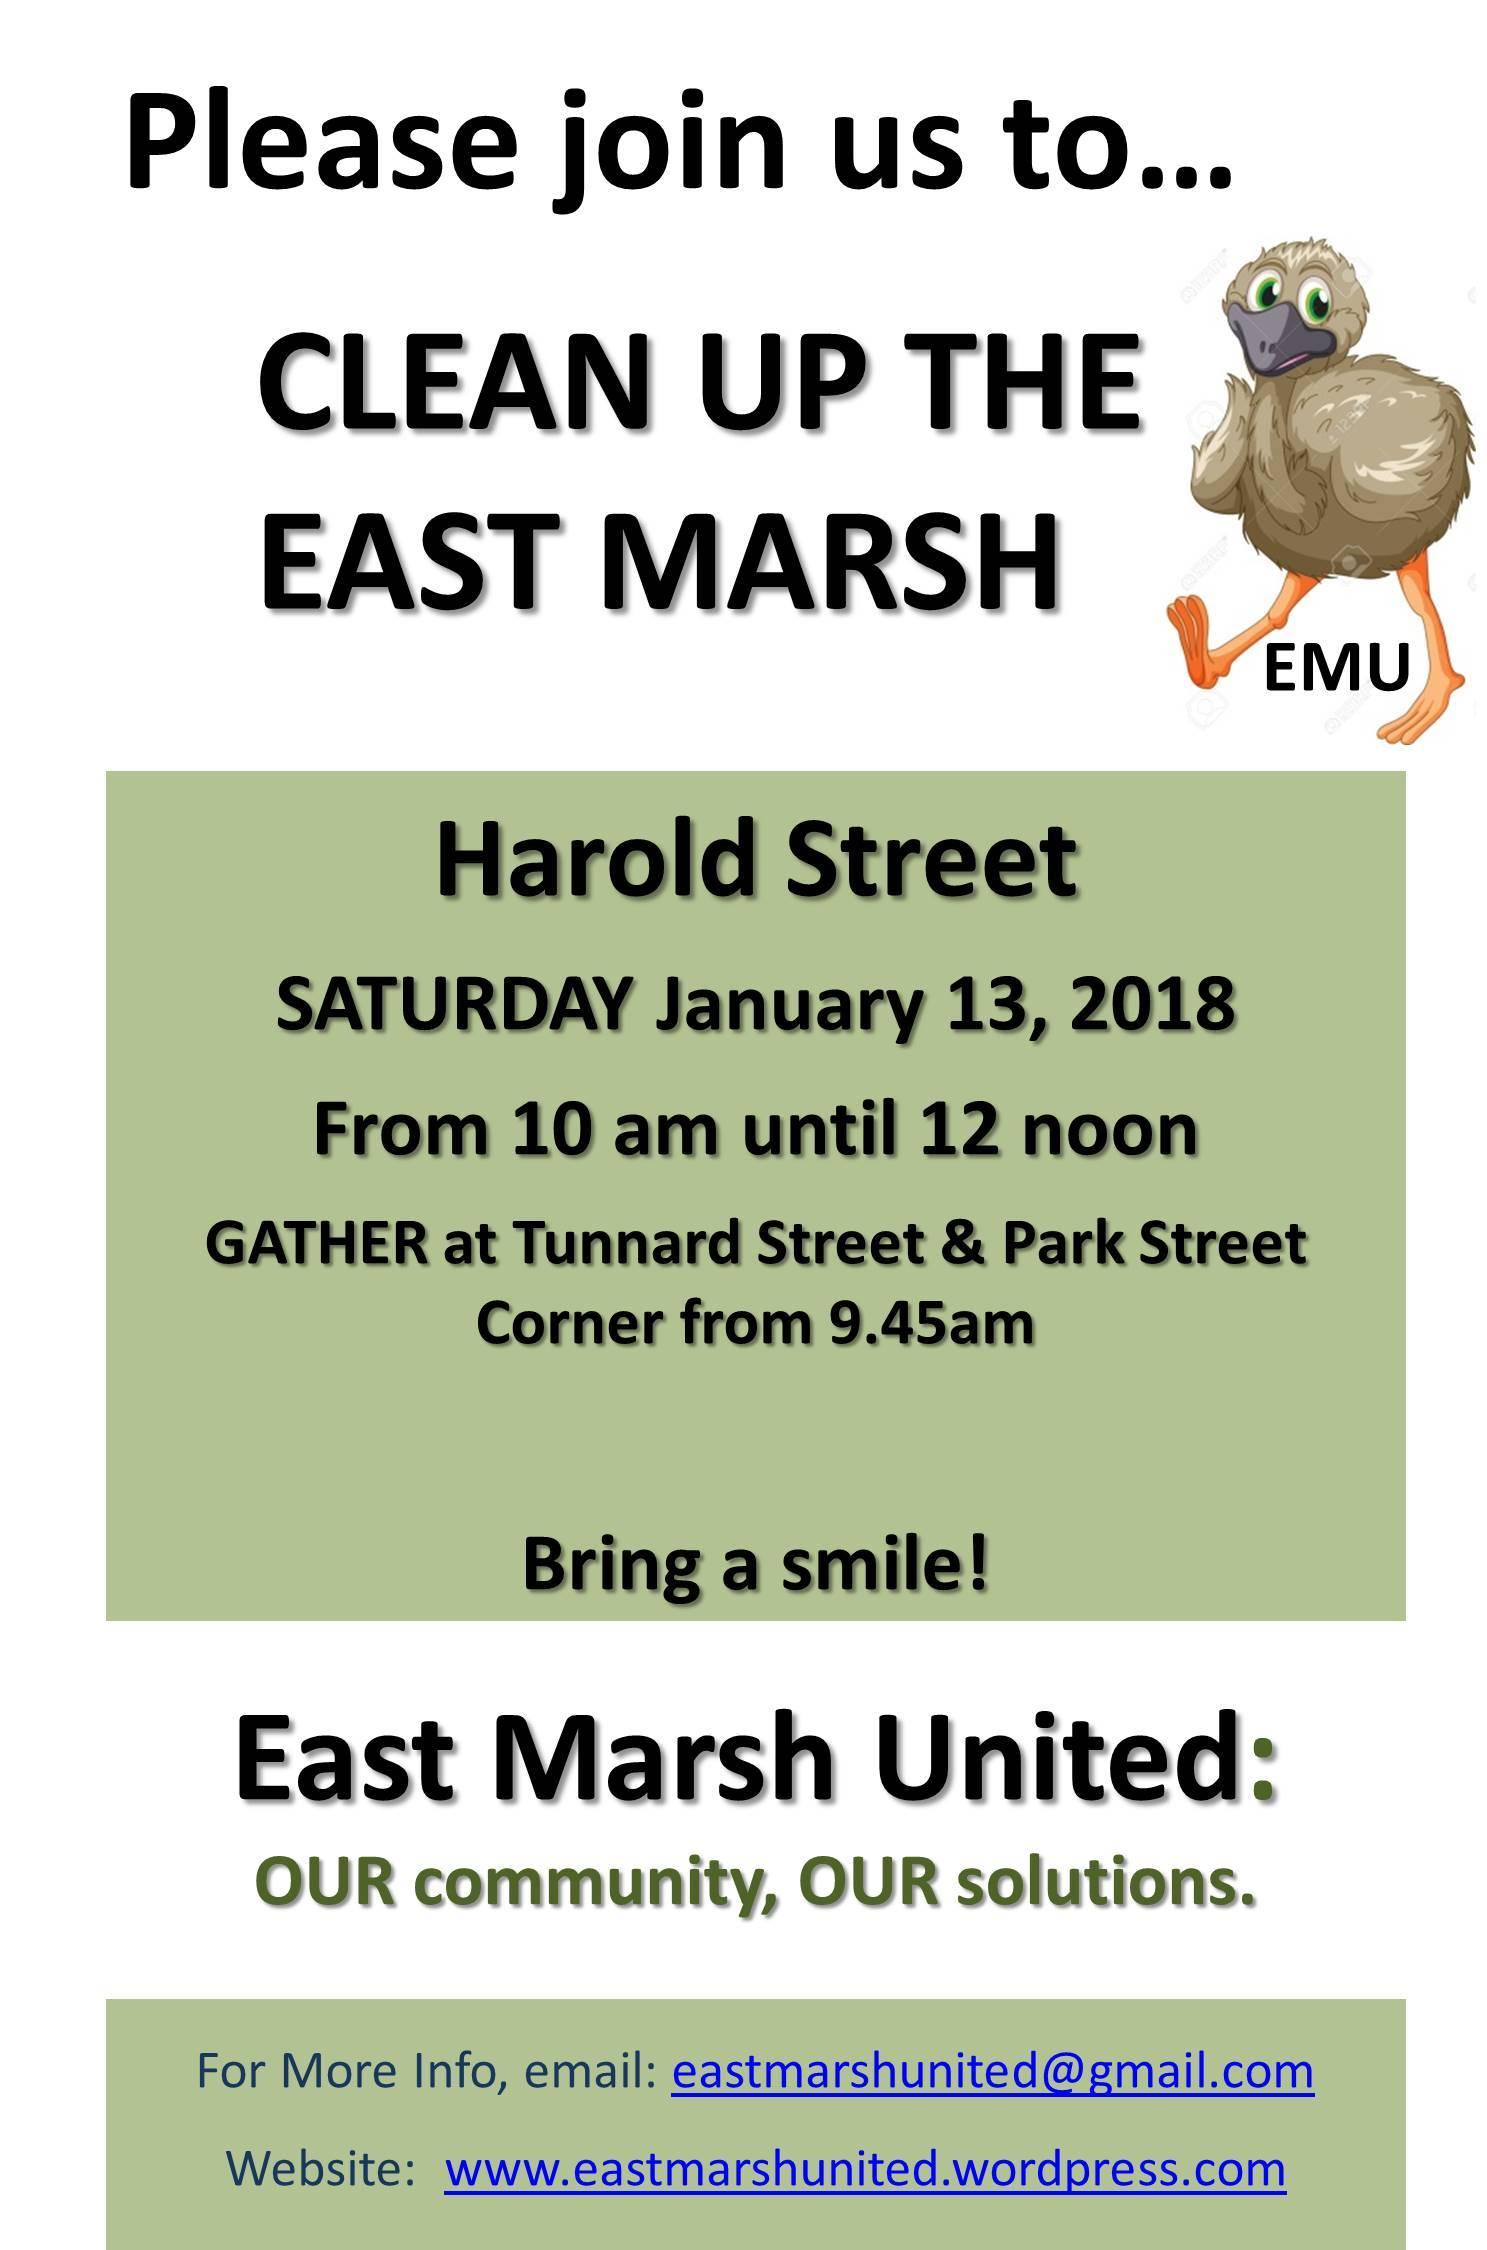 East Marsh United Flyer 2018-01-13 Street Clean - Harold Street